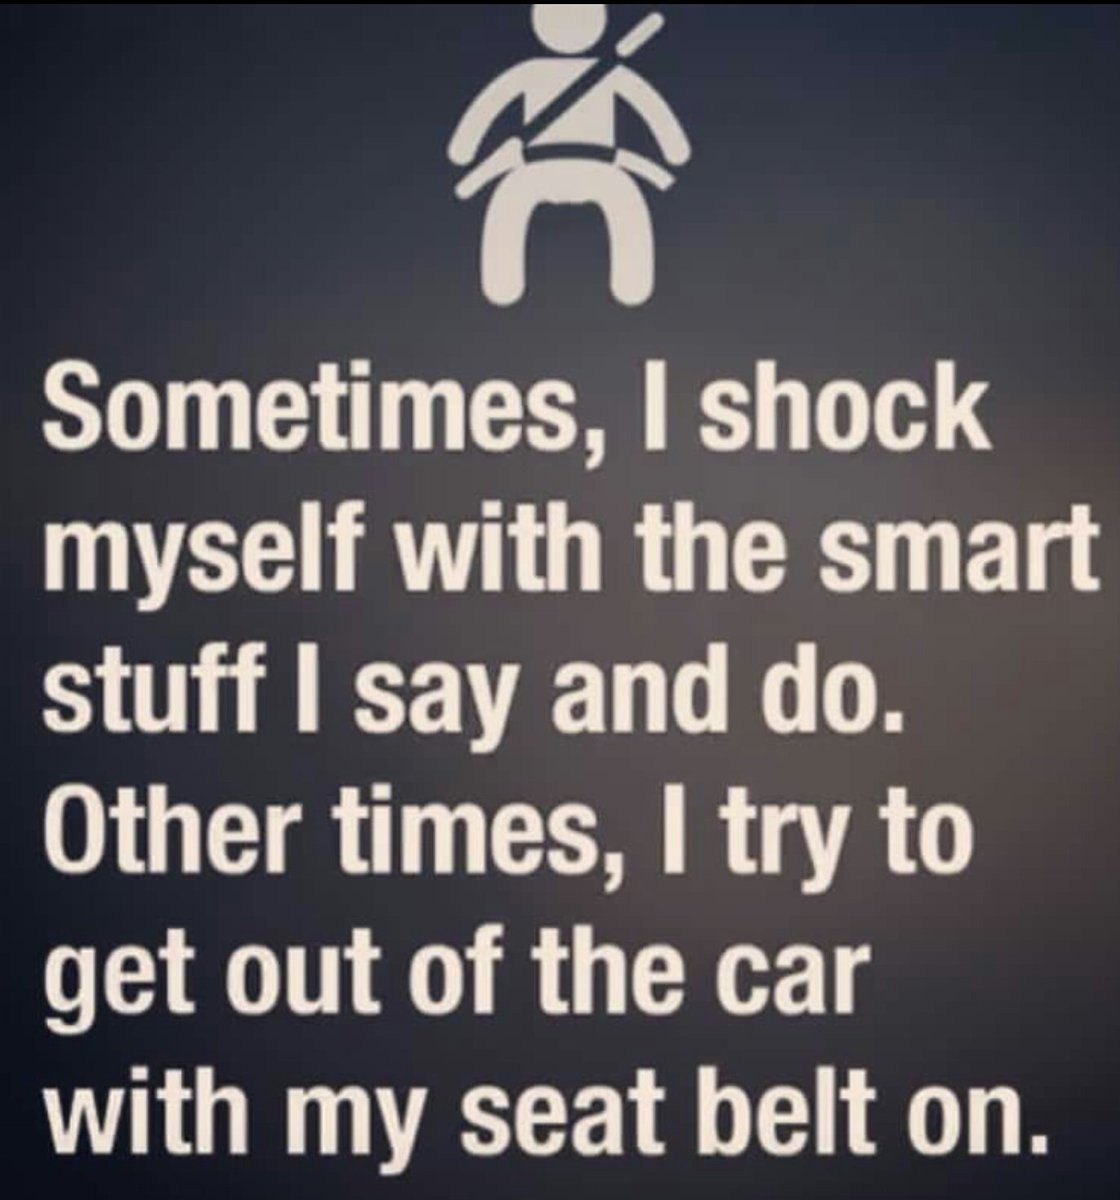 Juha Lehtonen On Twitter Sometimes I Shock Myself With The Smart Stuff I Say And Do Other